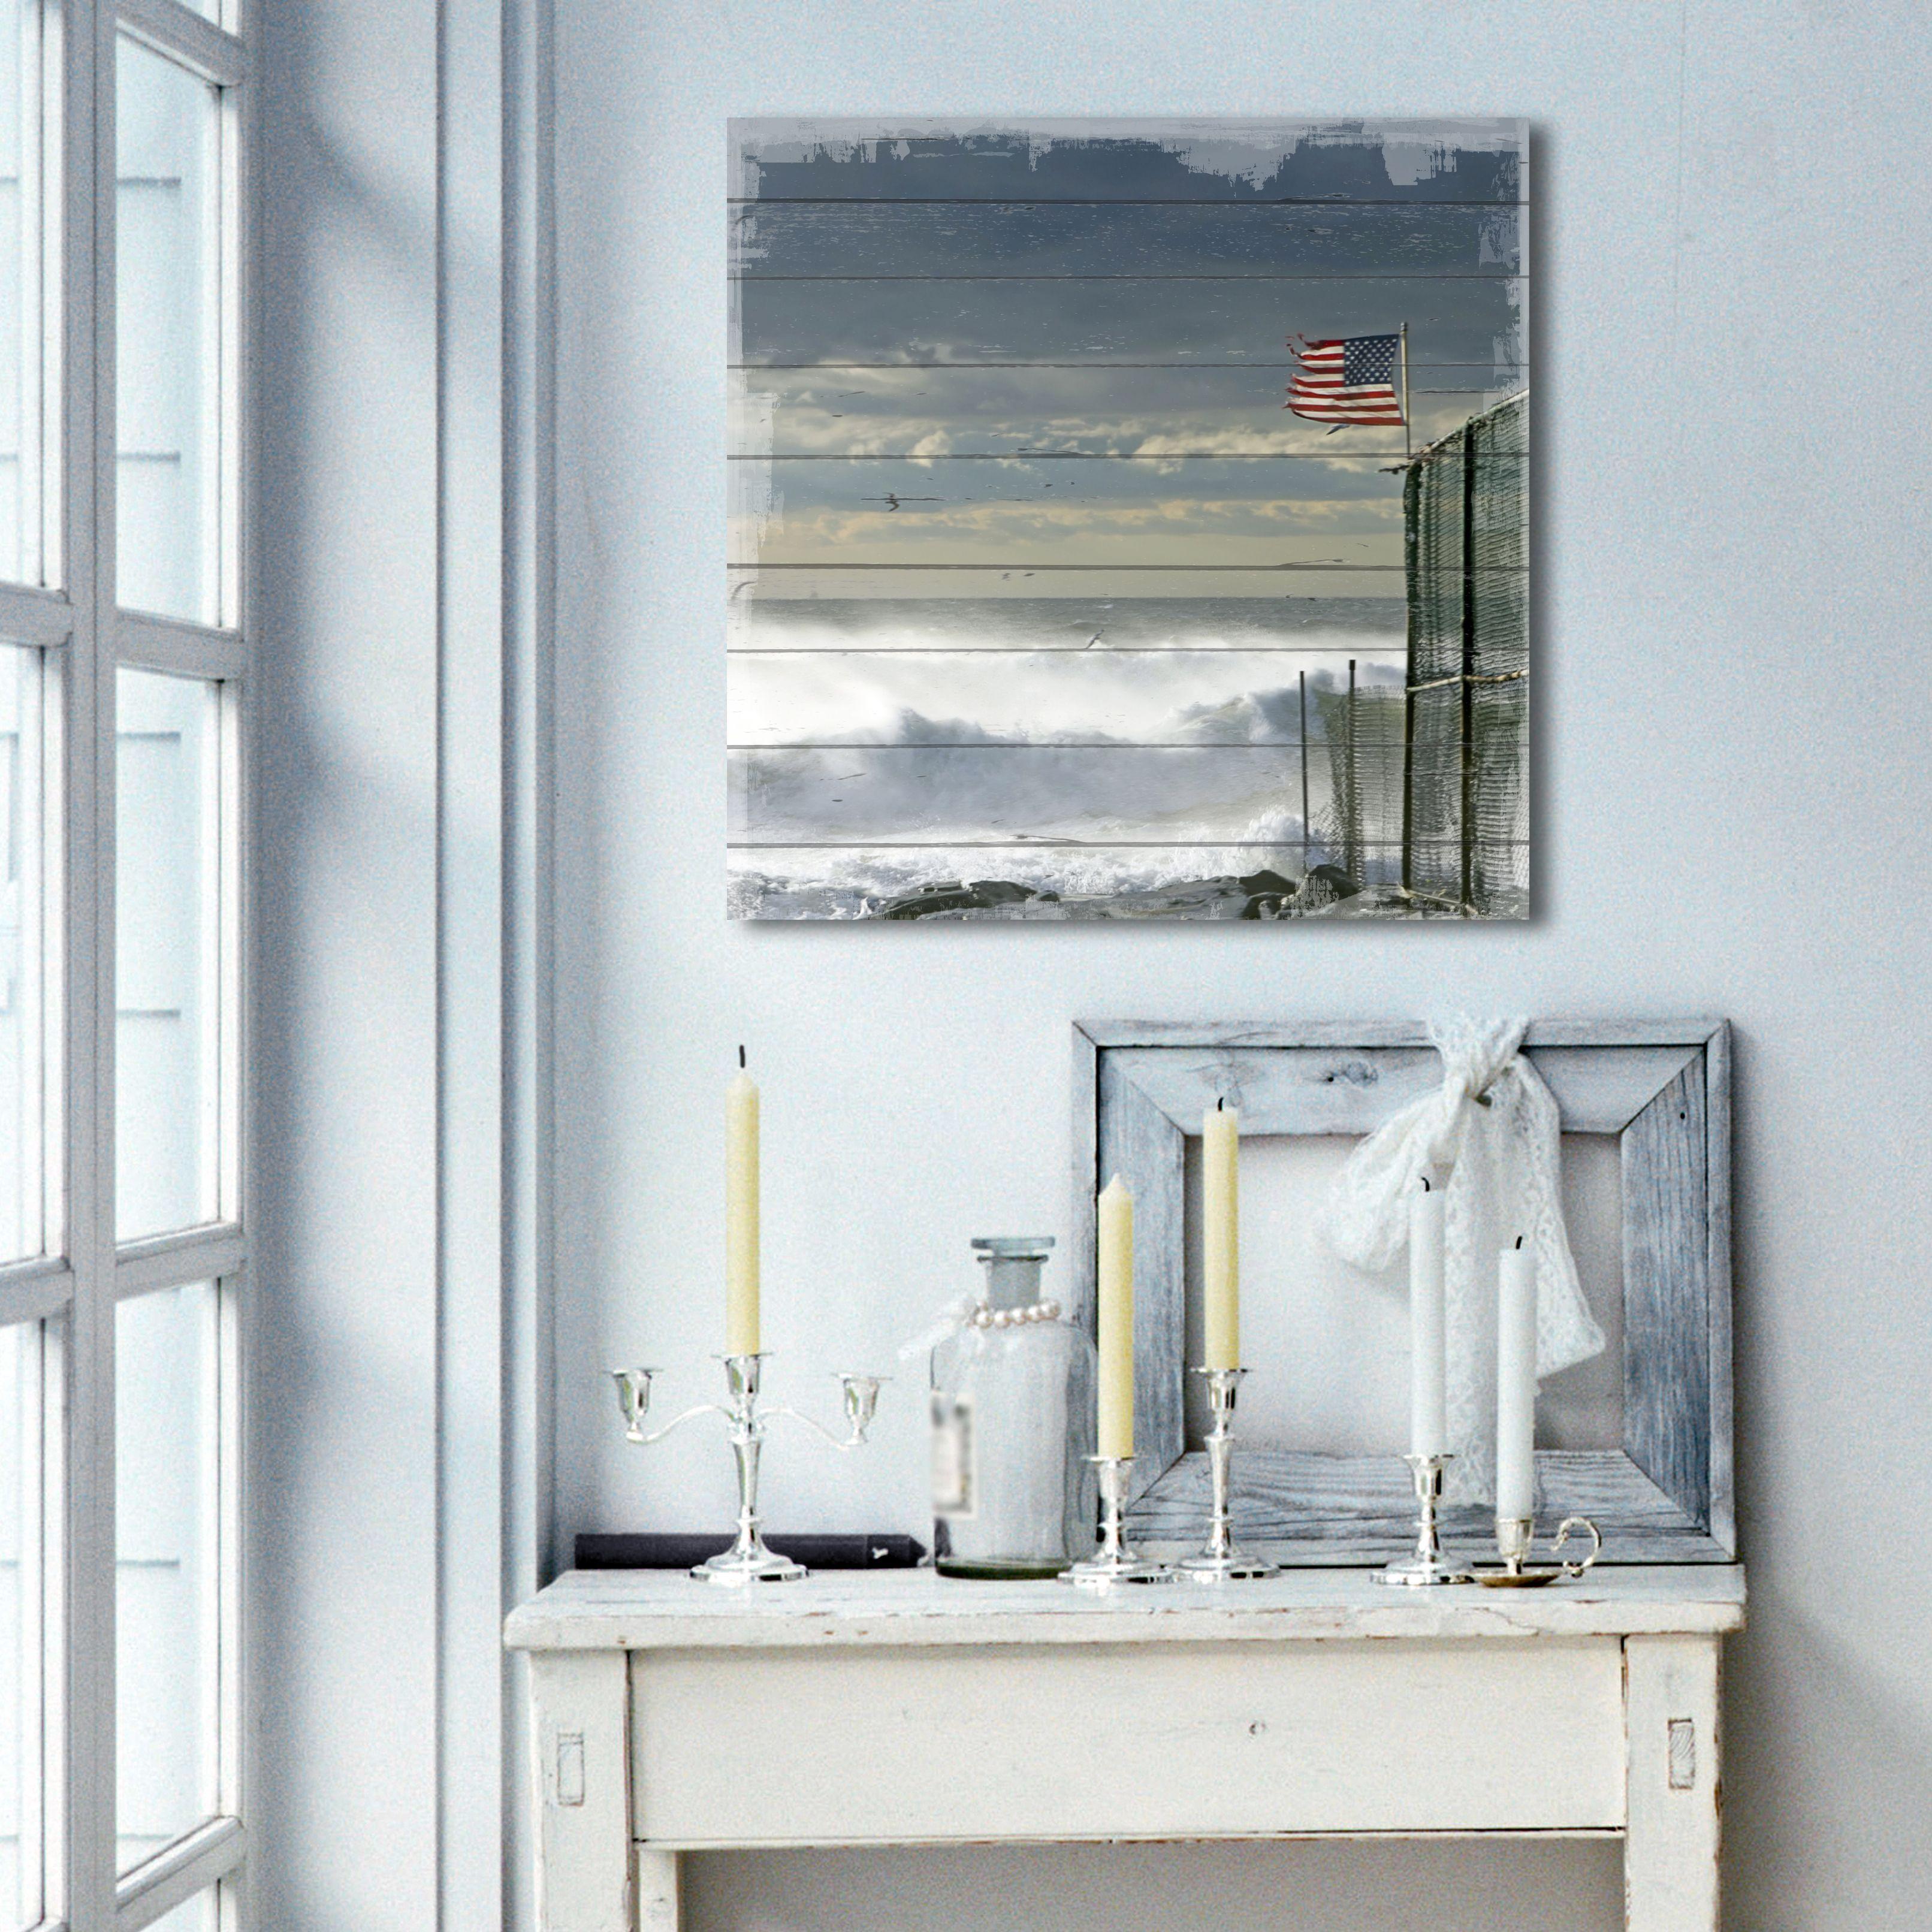 Vintage Cuadros Lifestyle Wandbild aus Holz Rose Shabby-Look Gr/ö/ße:ca 50x50 cm Geschenk Holzbild Landhaus